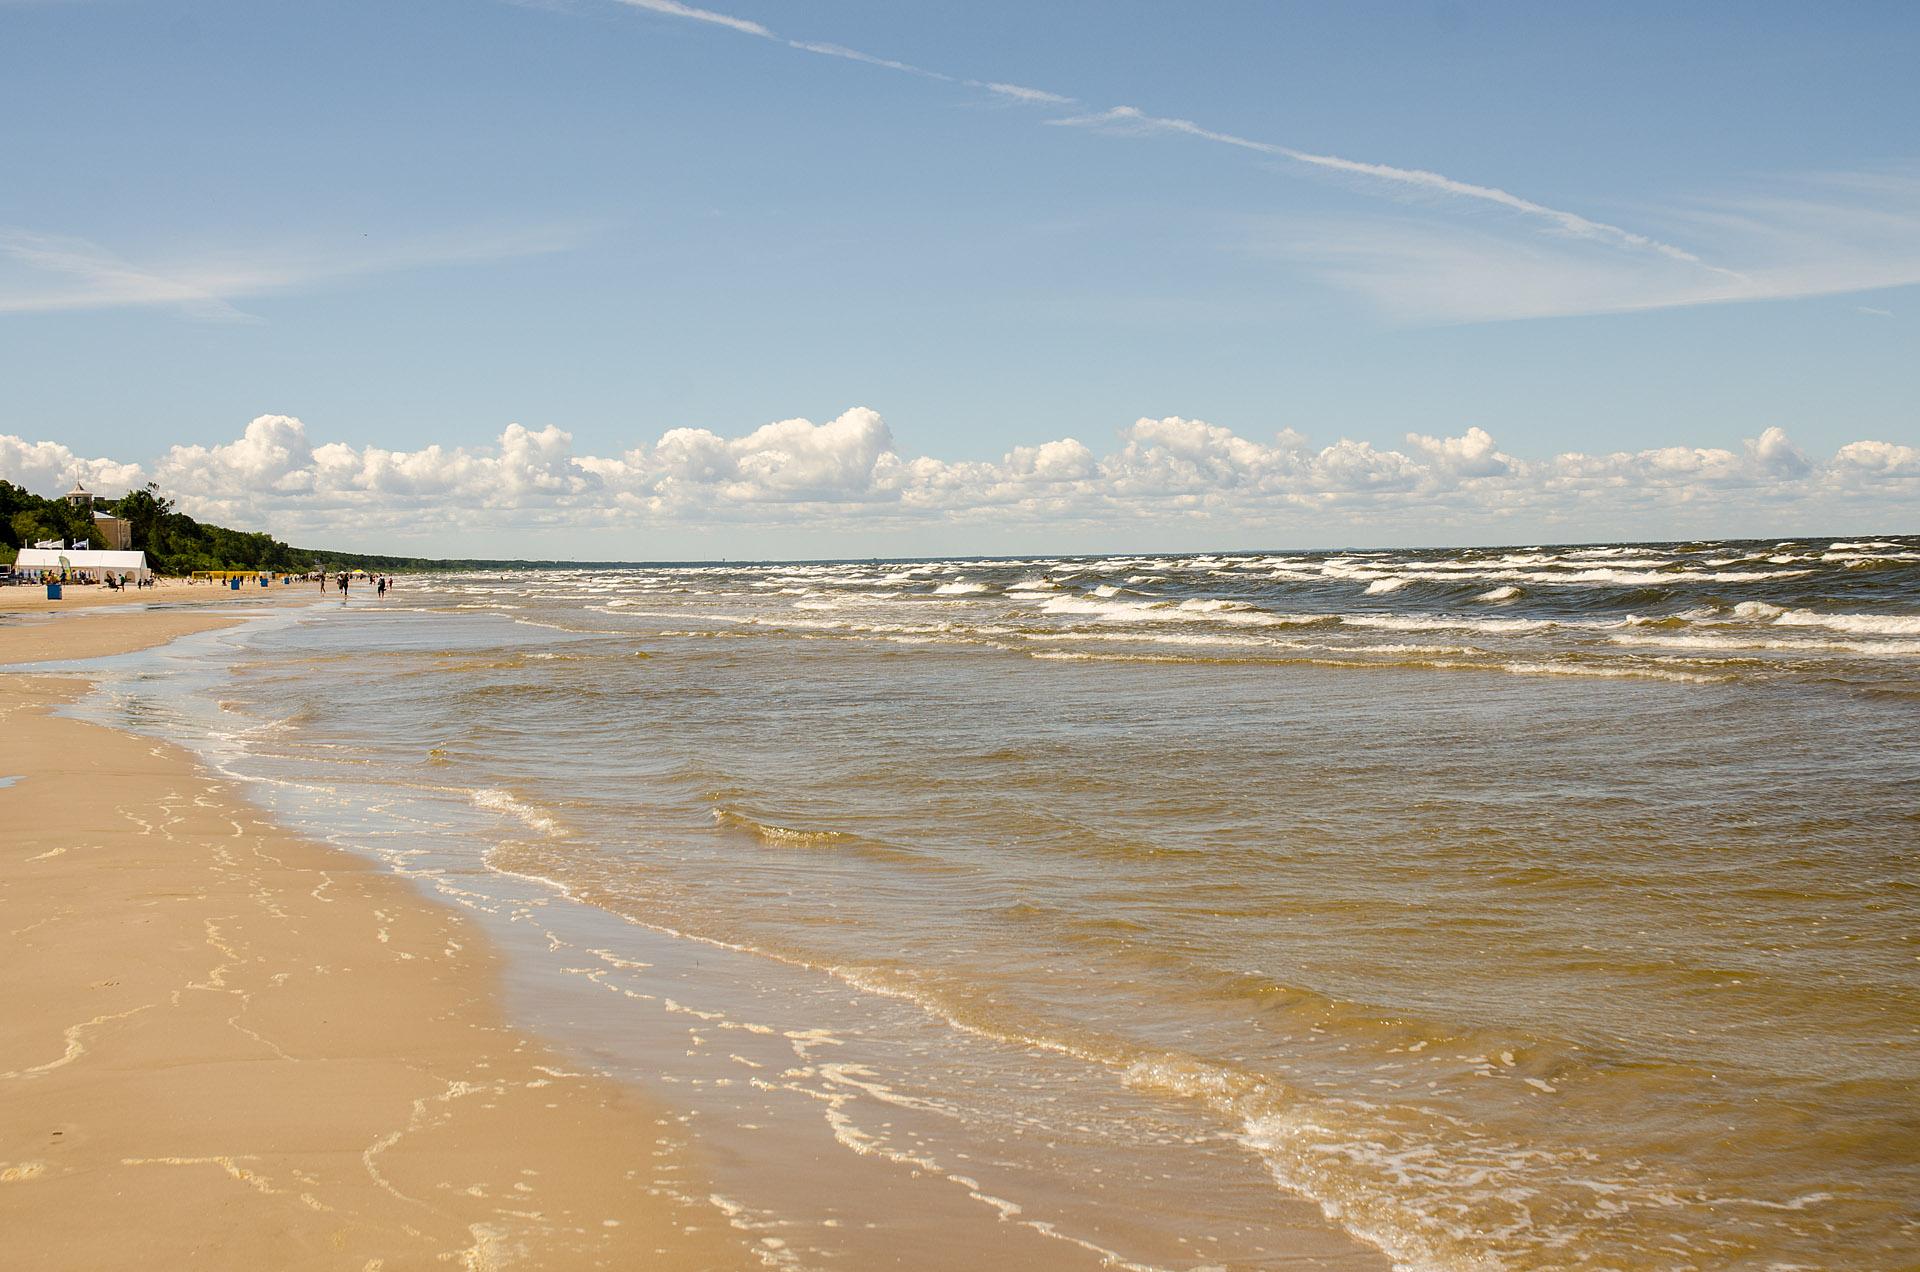 Baltic Sea beaches